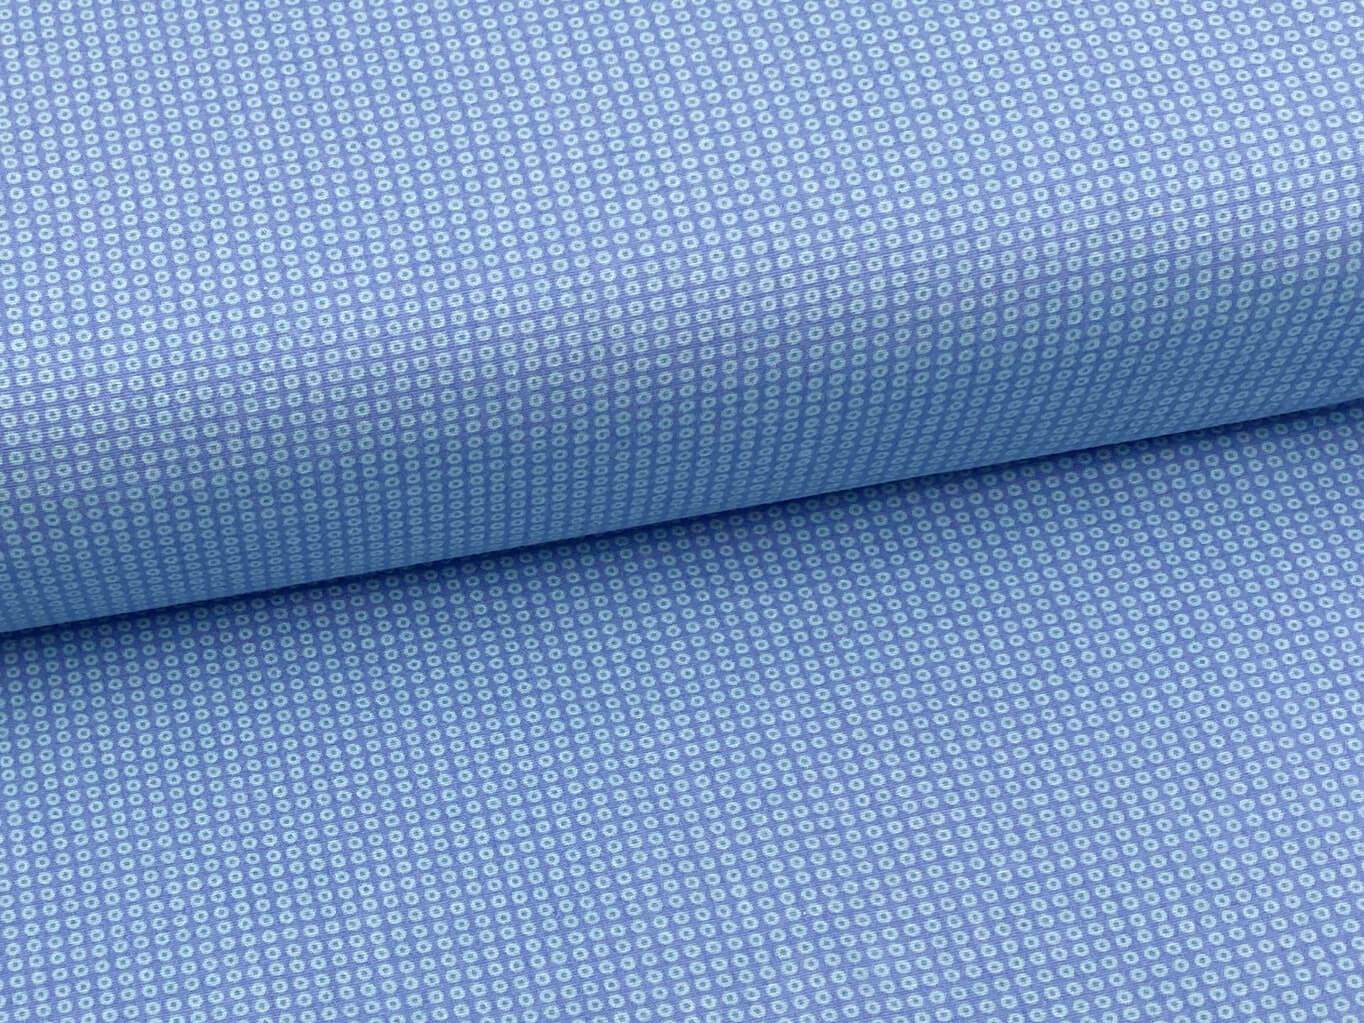 Mirtex FLANEL 150 (11676-1 drobná kolečka modrá) 150cm / VELKOOBCHOD Ceník: VELKOOBCHOD: po celých r